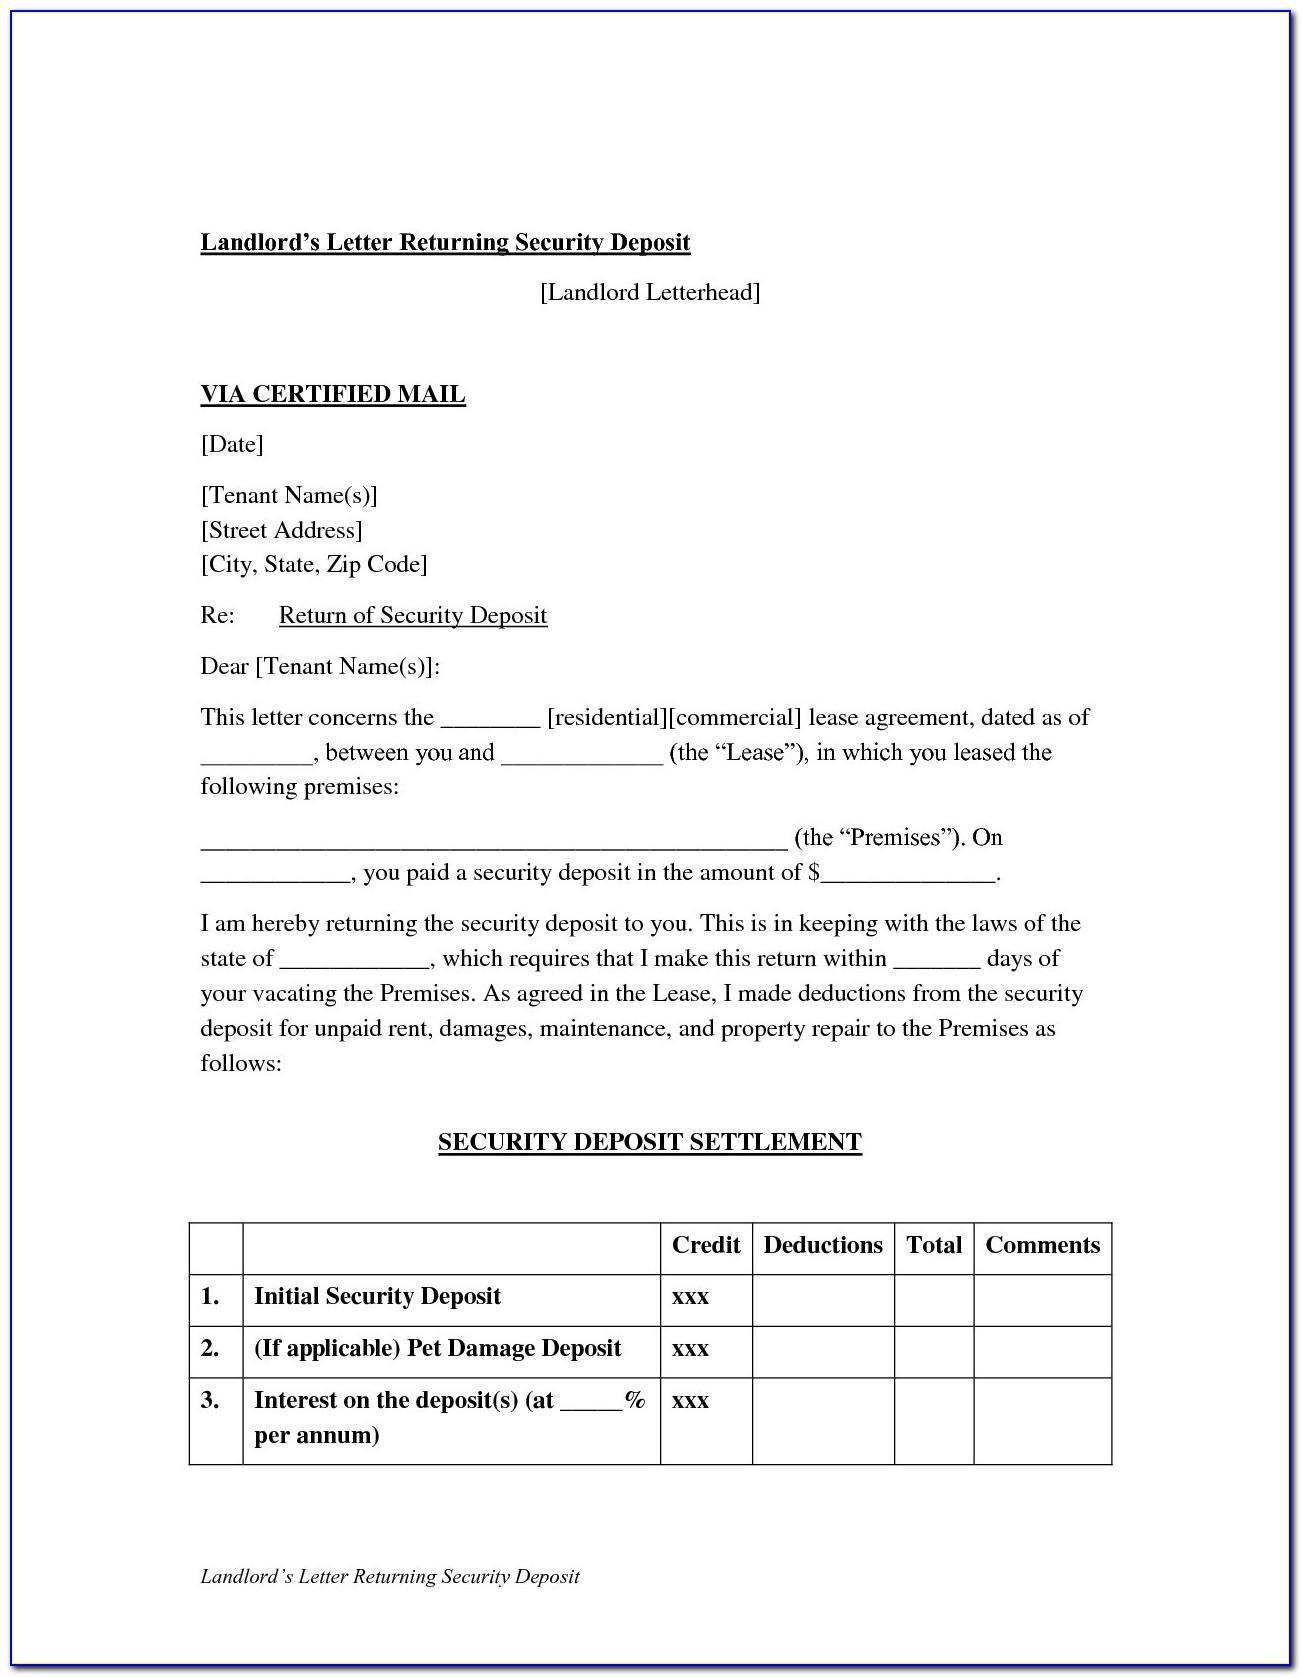 Sample Security Deposit Refund Letter Texas